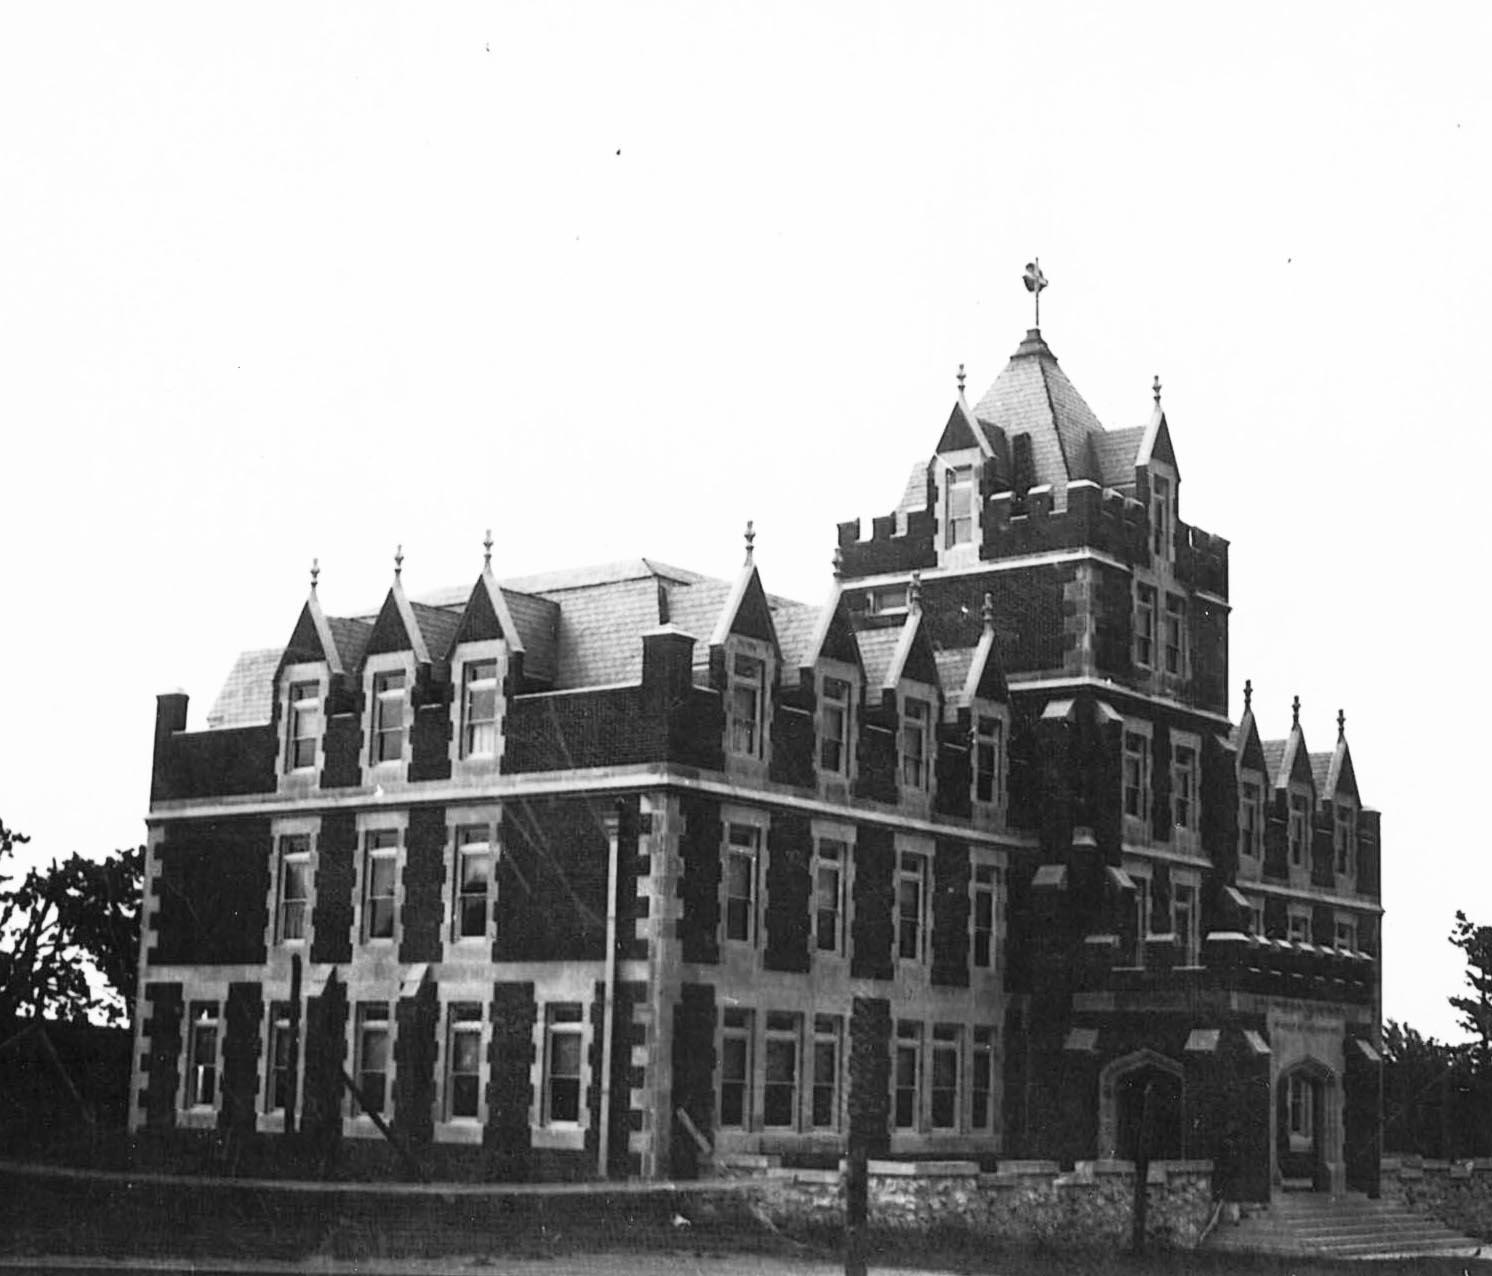 Elderdice Hall circa 1920